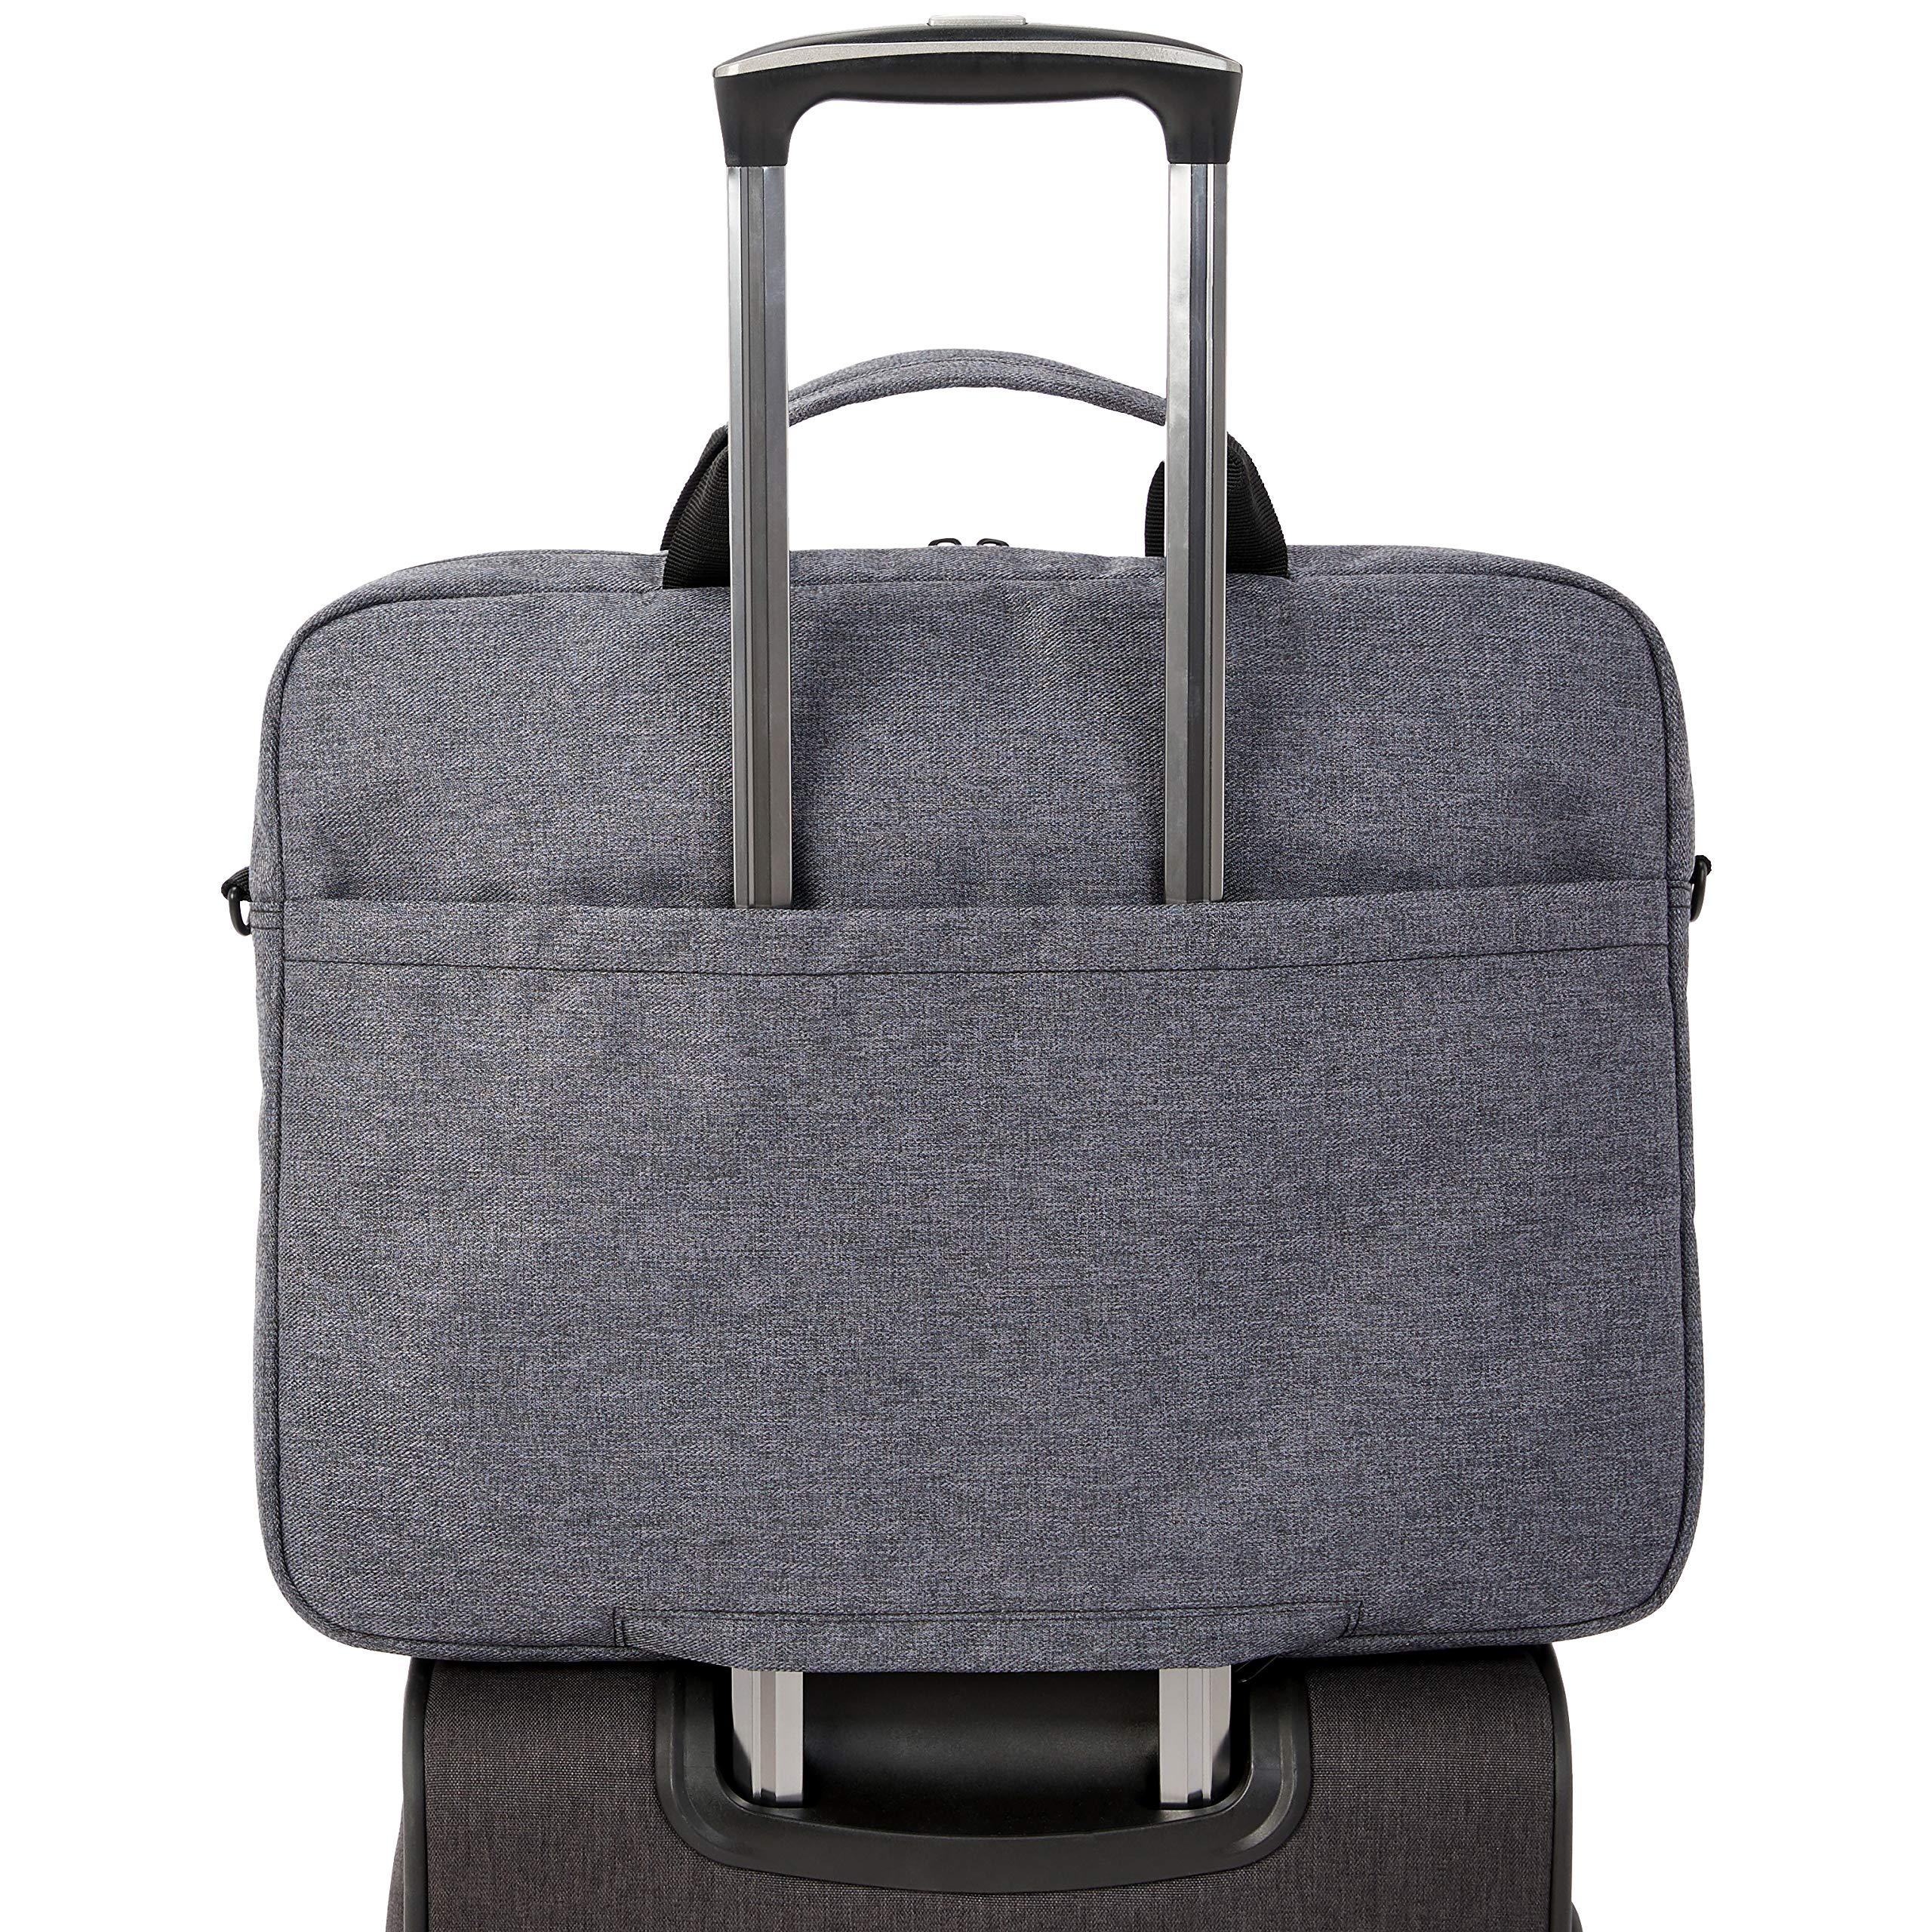 AmazonBasics Urban Laptop and Tablet Case Bag, 17 Inch, Grey by AmazonBasics (Image #7)